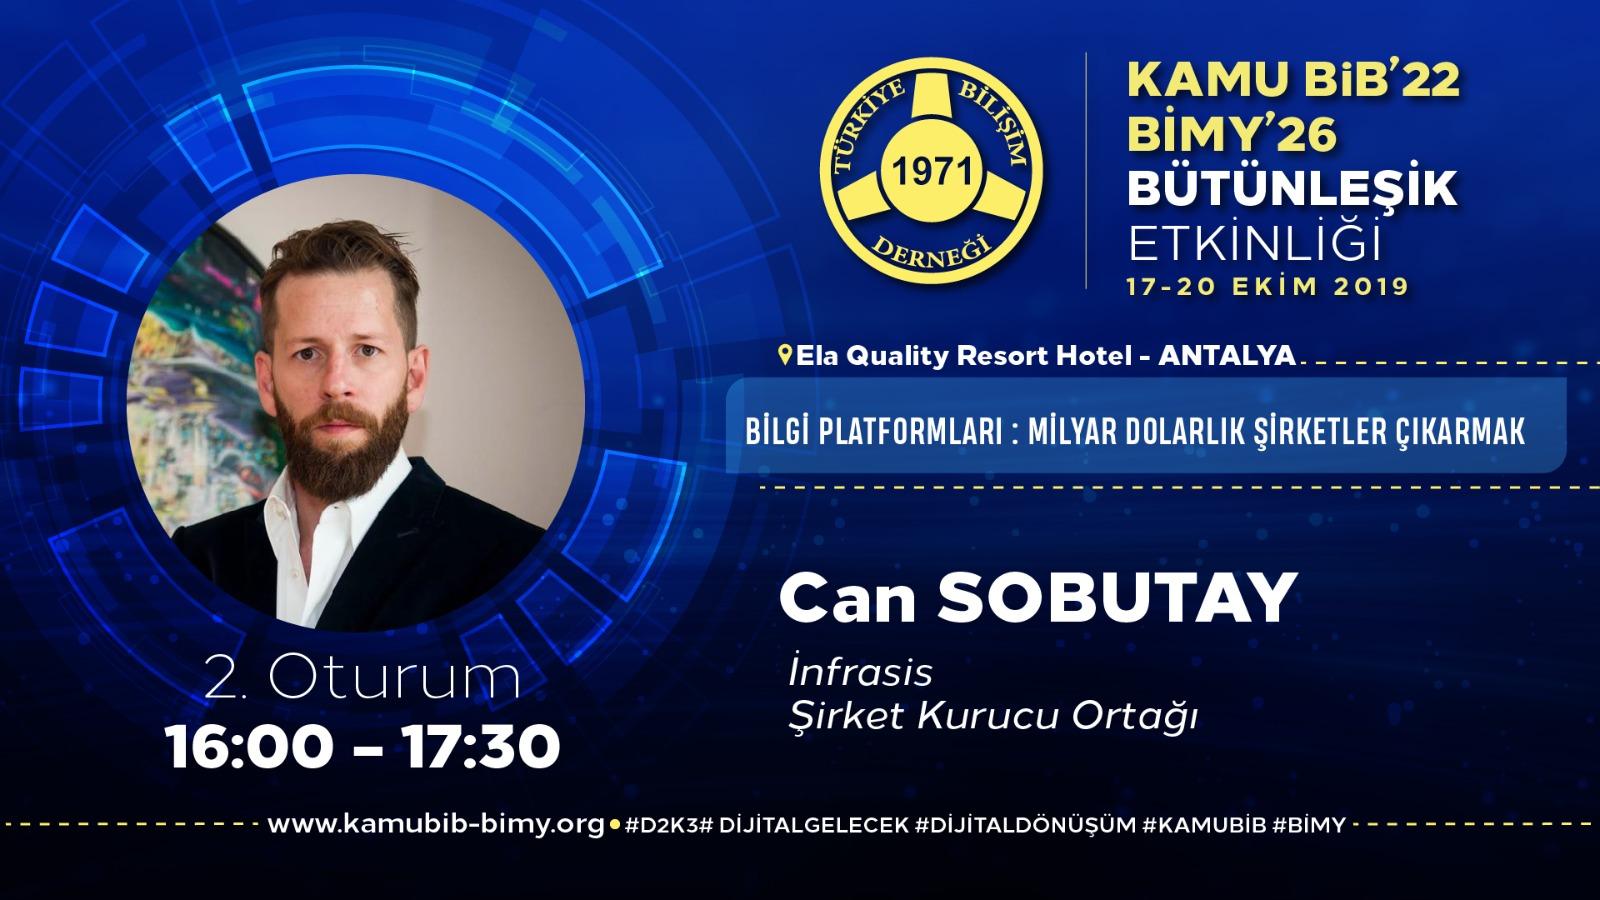 Can SOBUTAY - KamuBİB'22 BİMY'26